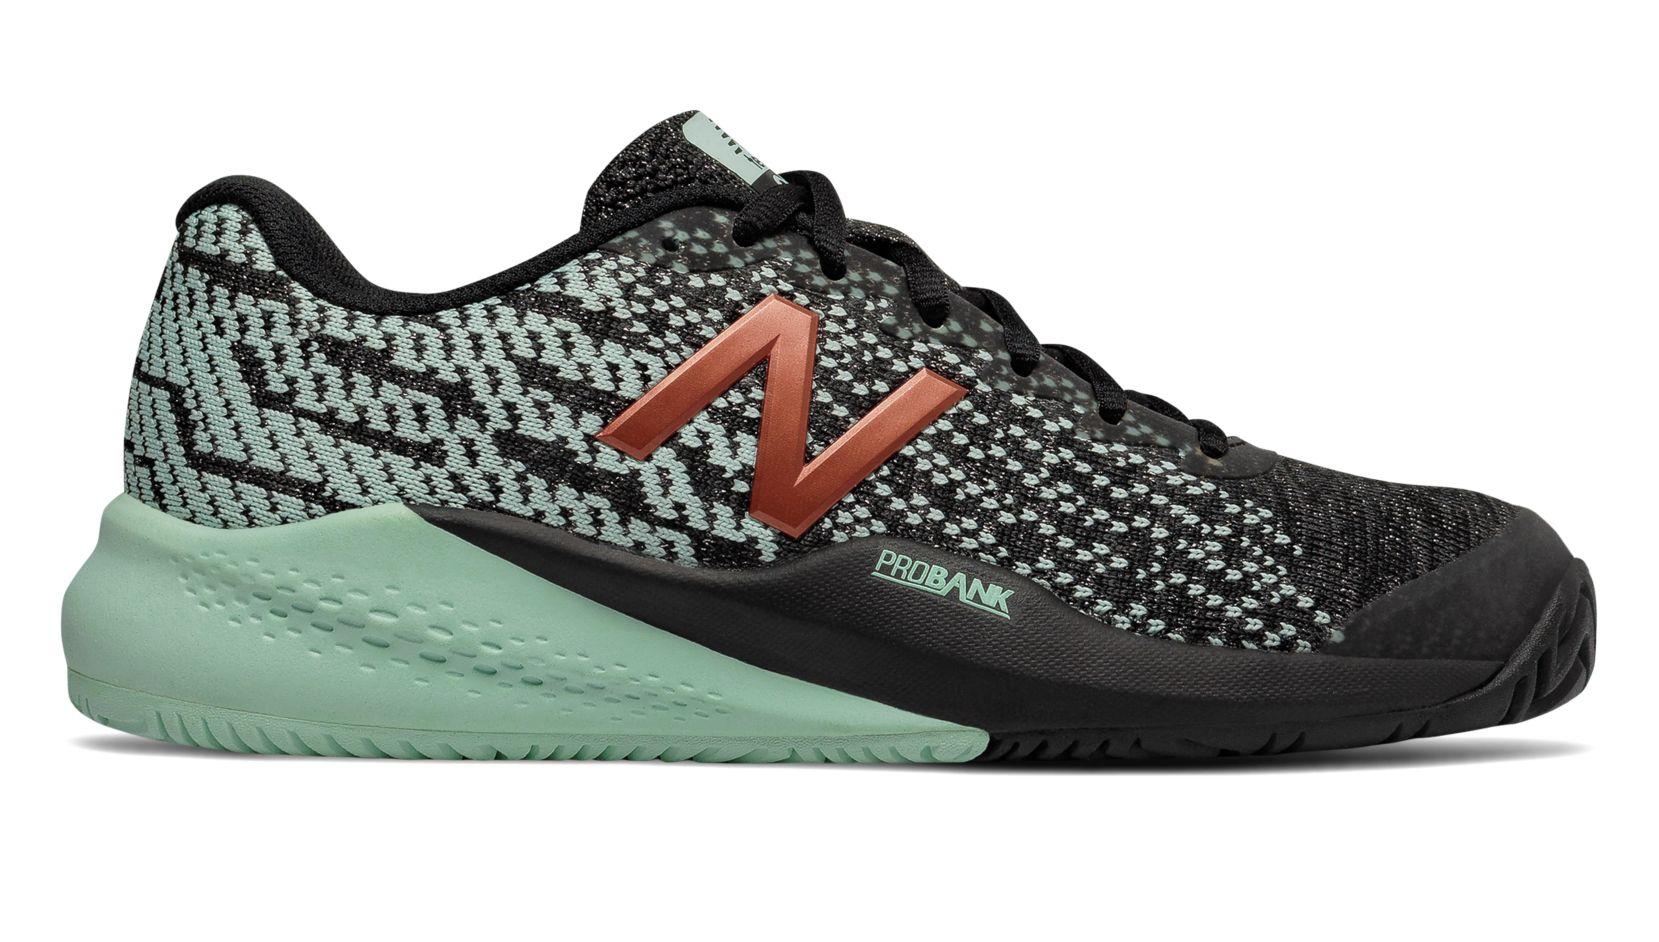 New Balance 996v3 tennis shoes